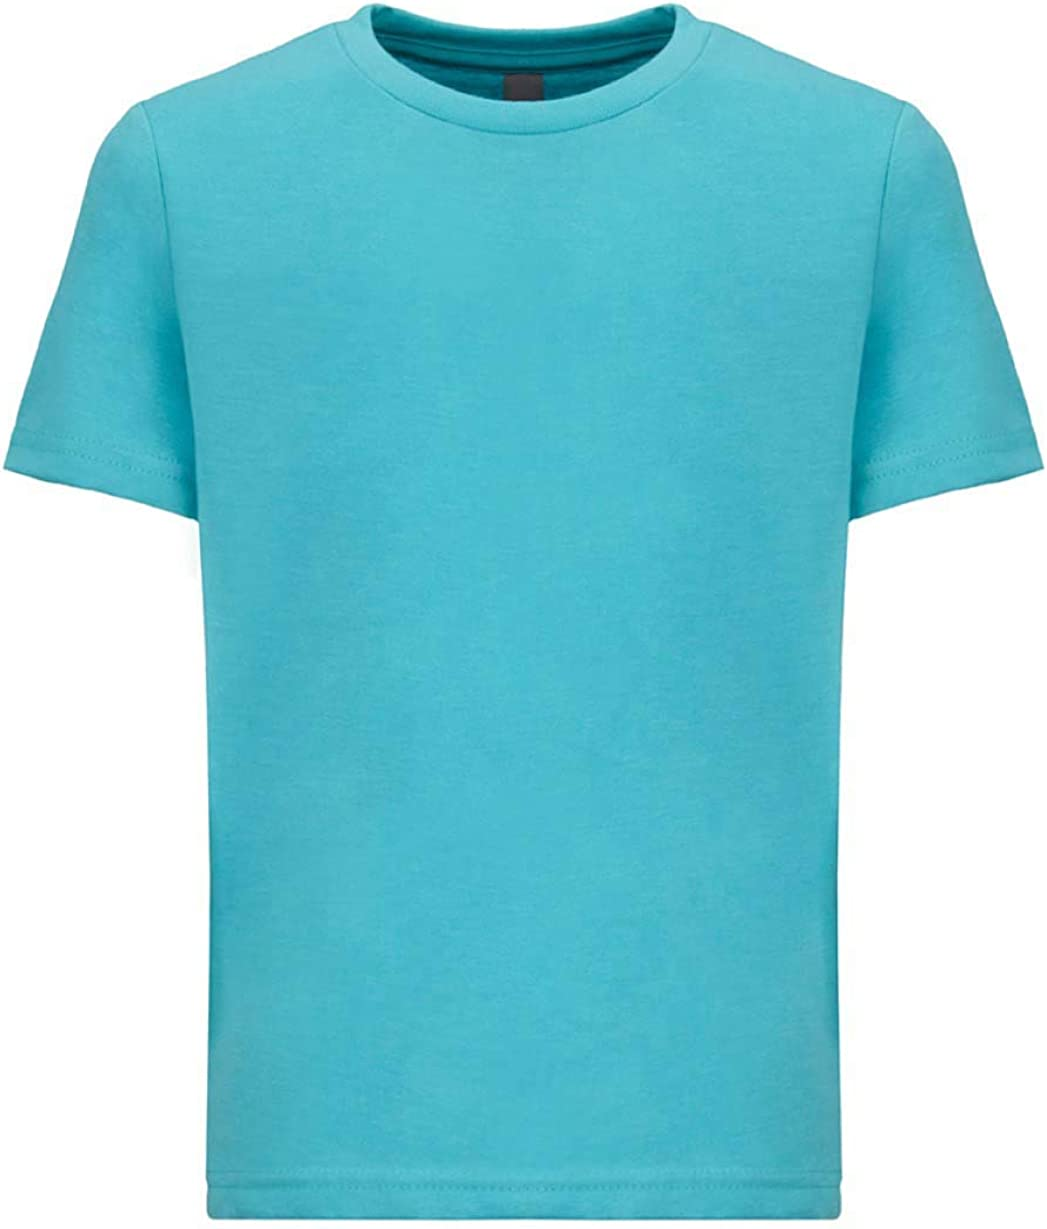 Next Level Kids CVC Crew Neck T-Shirt Tahiti Blue S